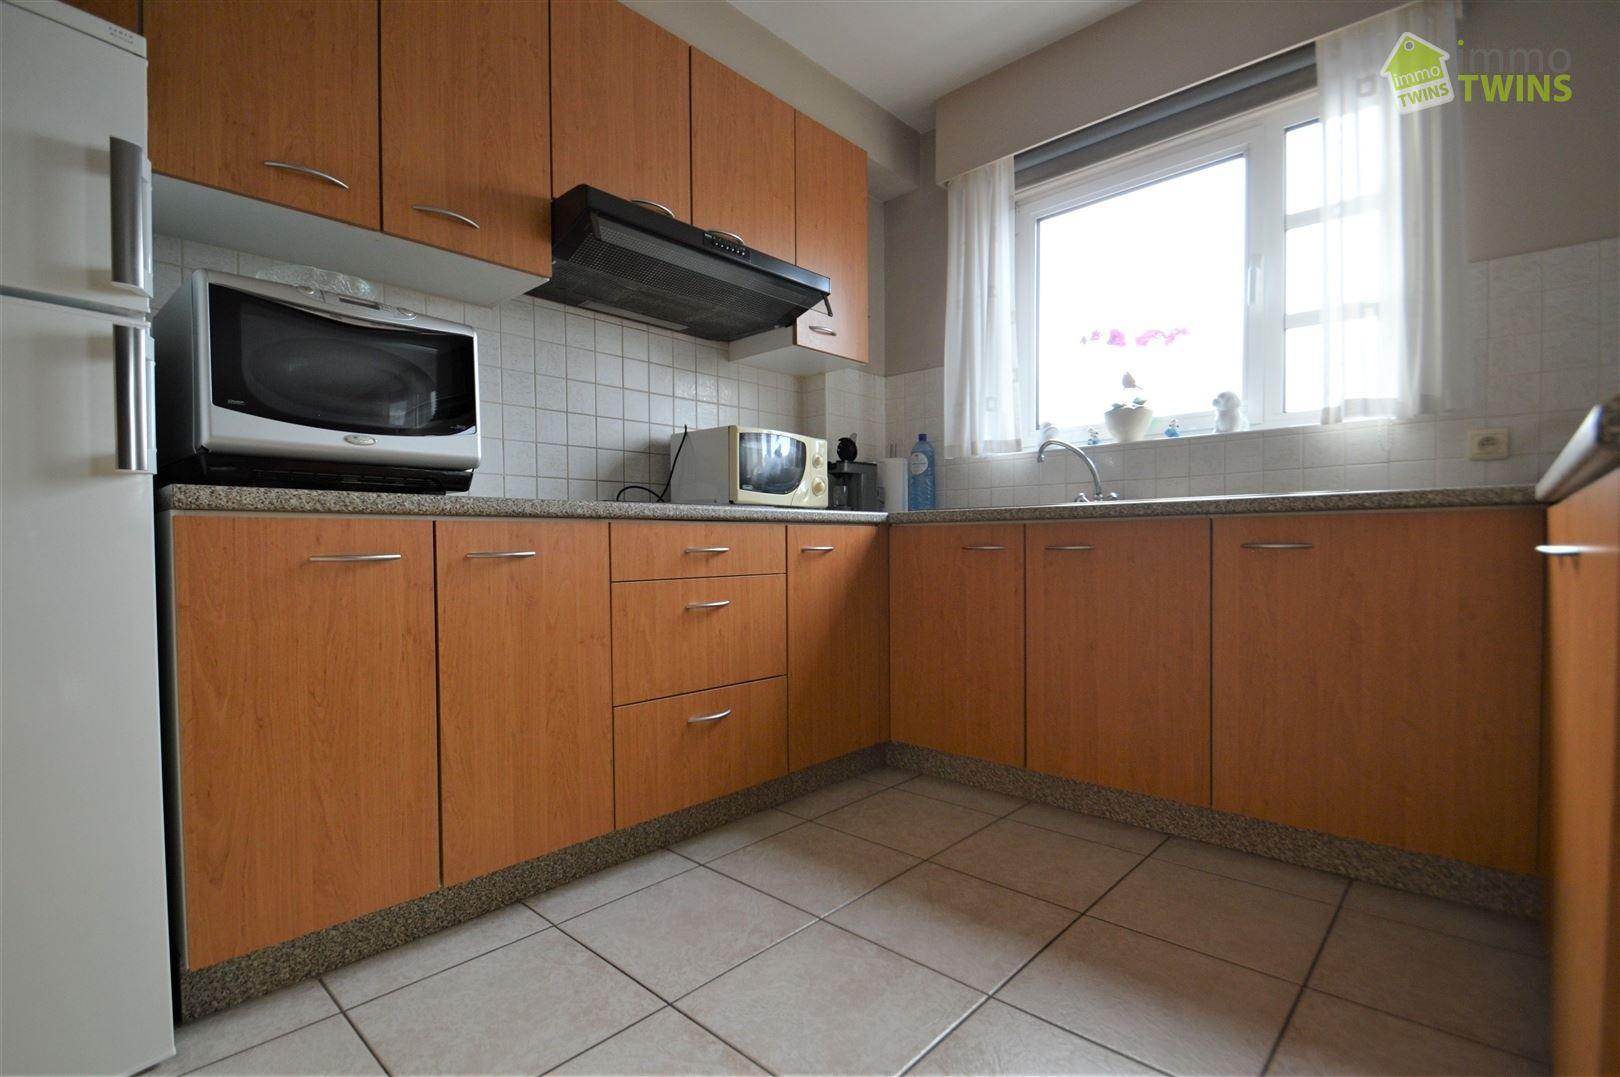 Foto 3 : Appartement te 9200 BAASRODE (België) - Prijs € 450